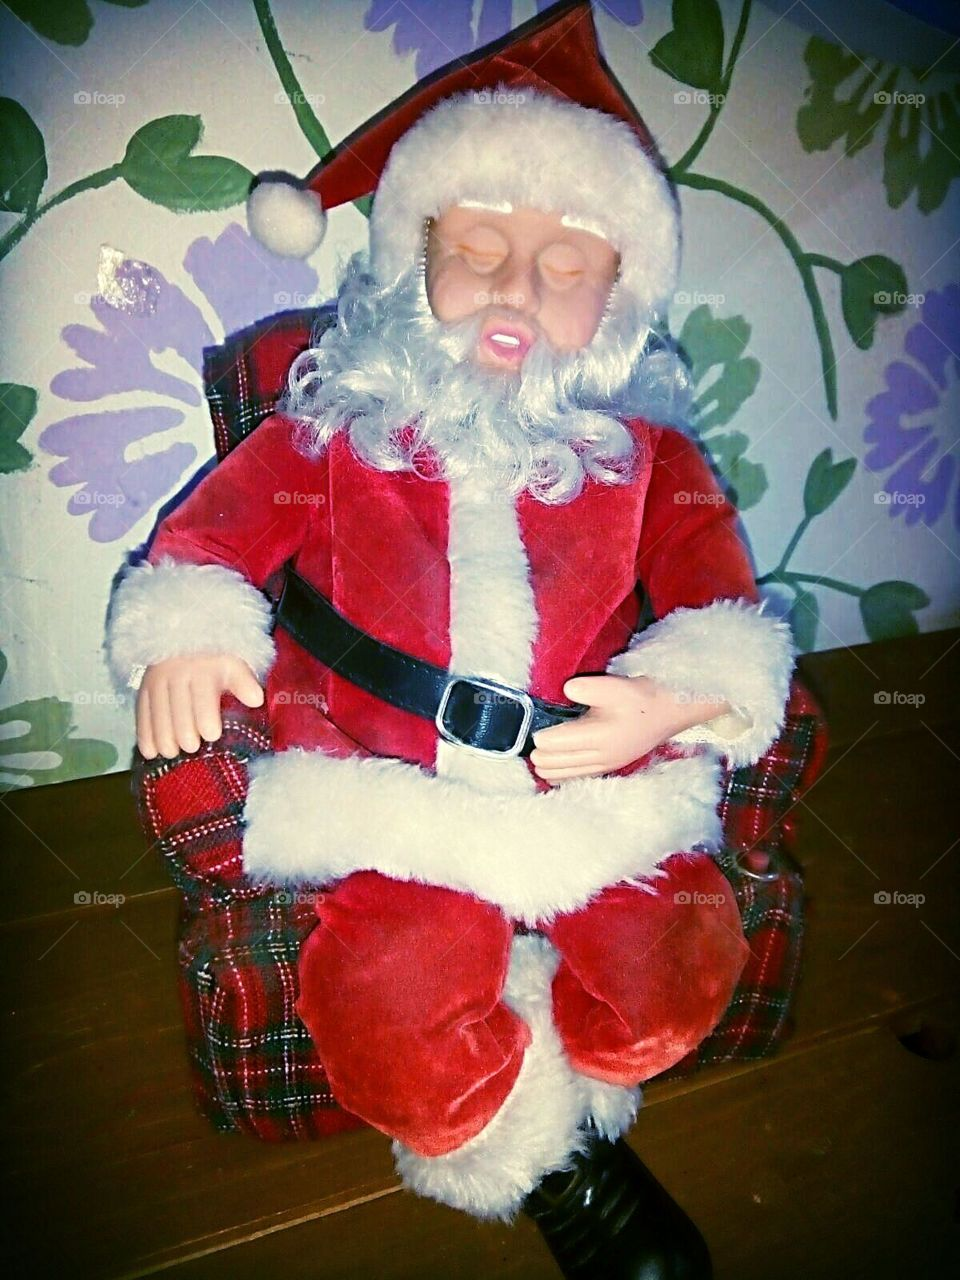 toy Santa Claus sleeping